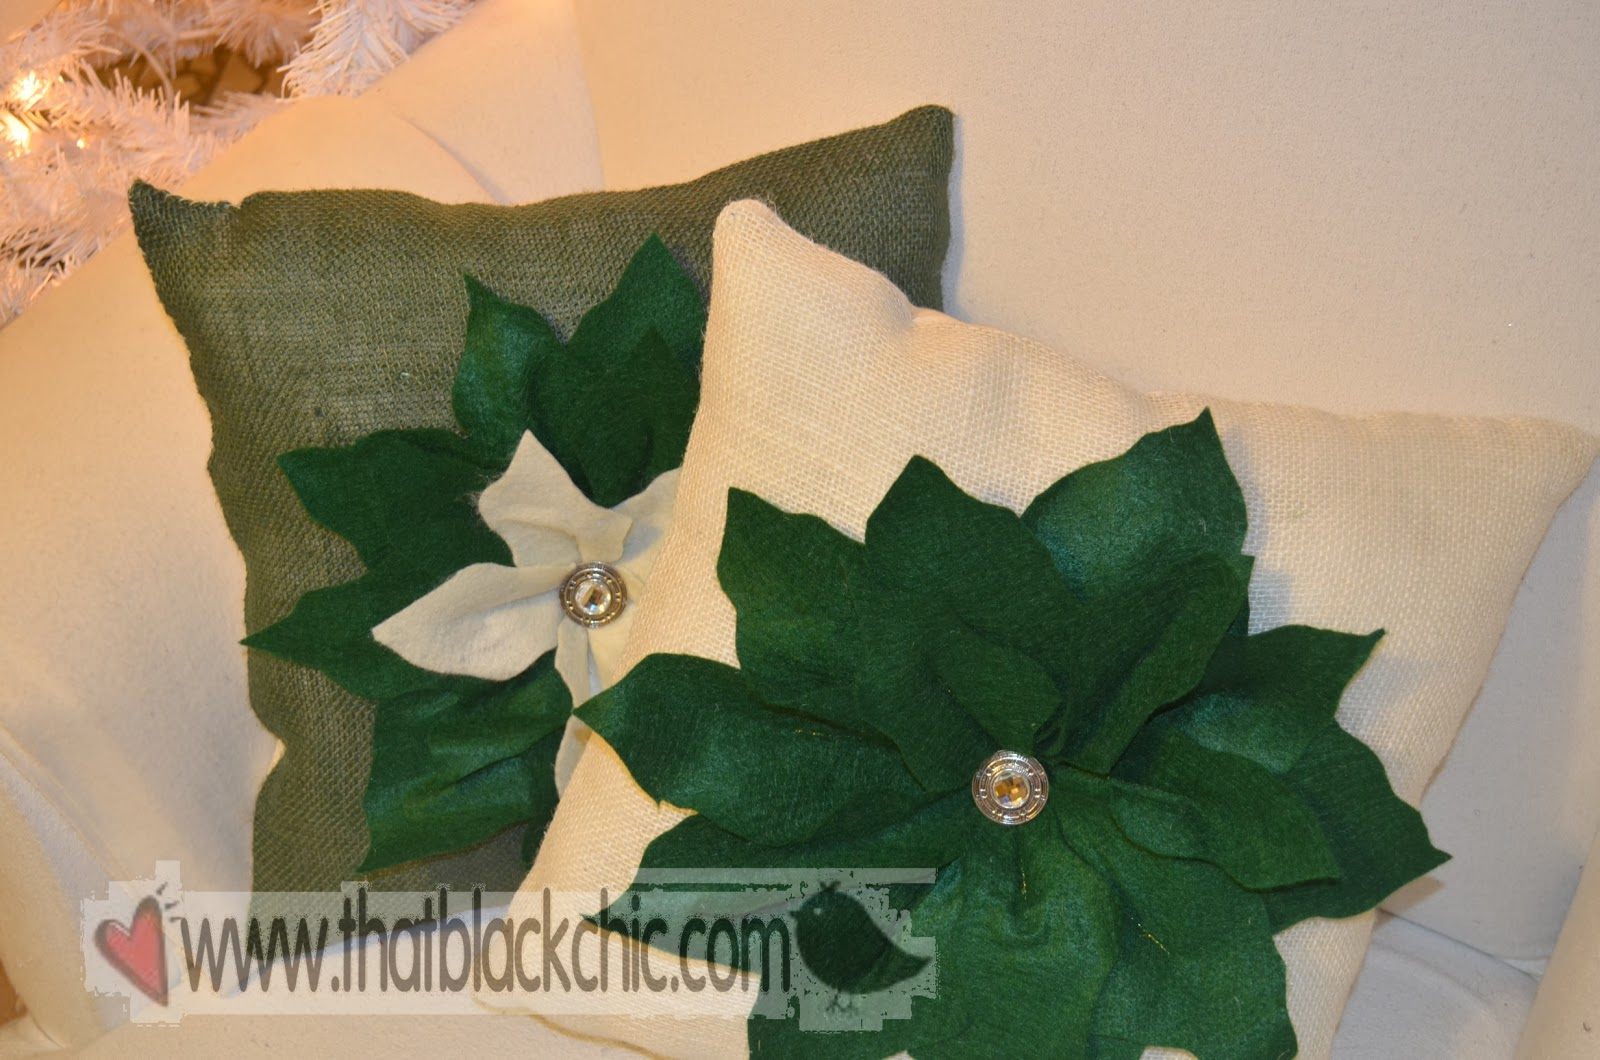 Diy Hi Jack Poinsettia Pillow By Pottery Barn That